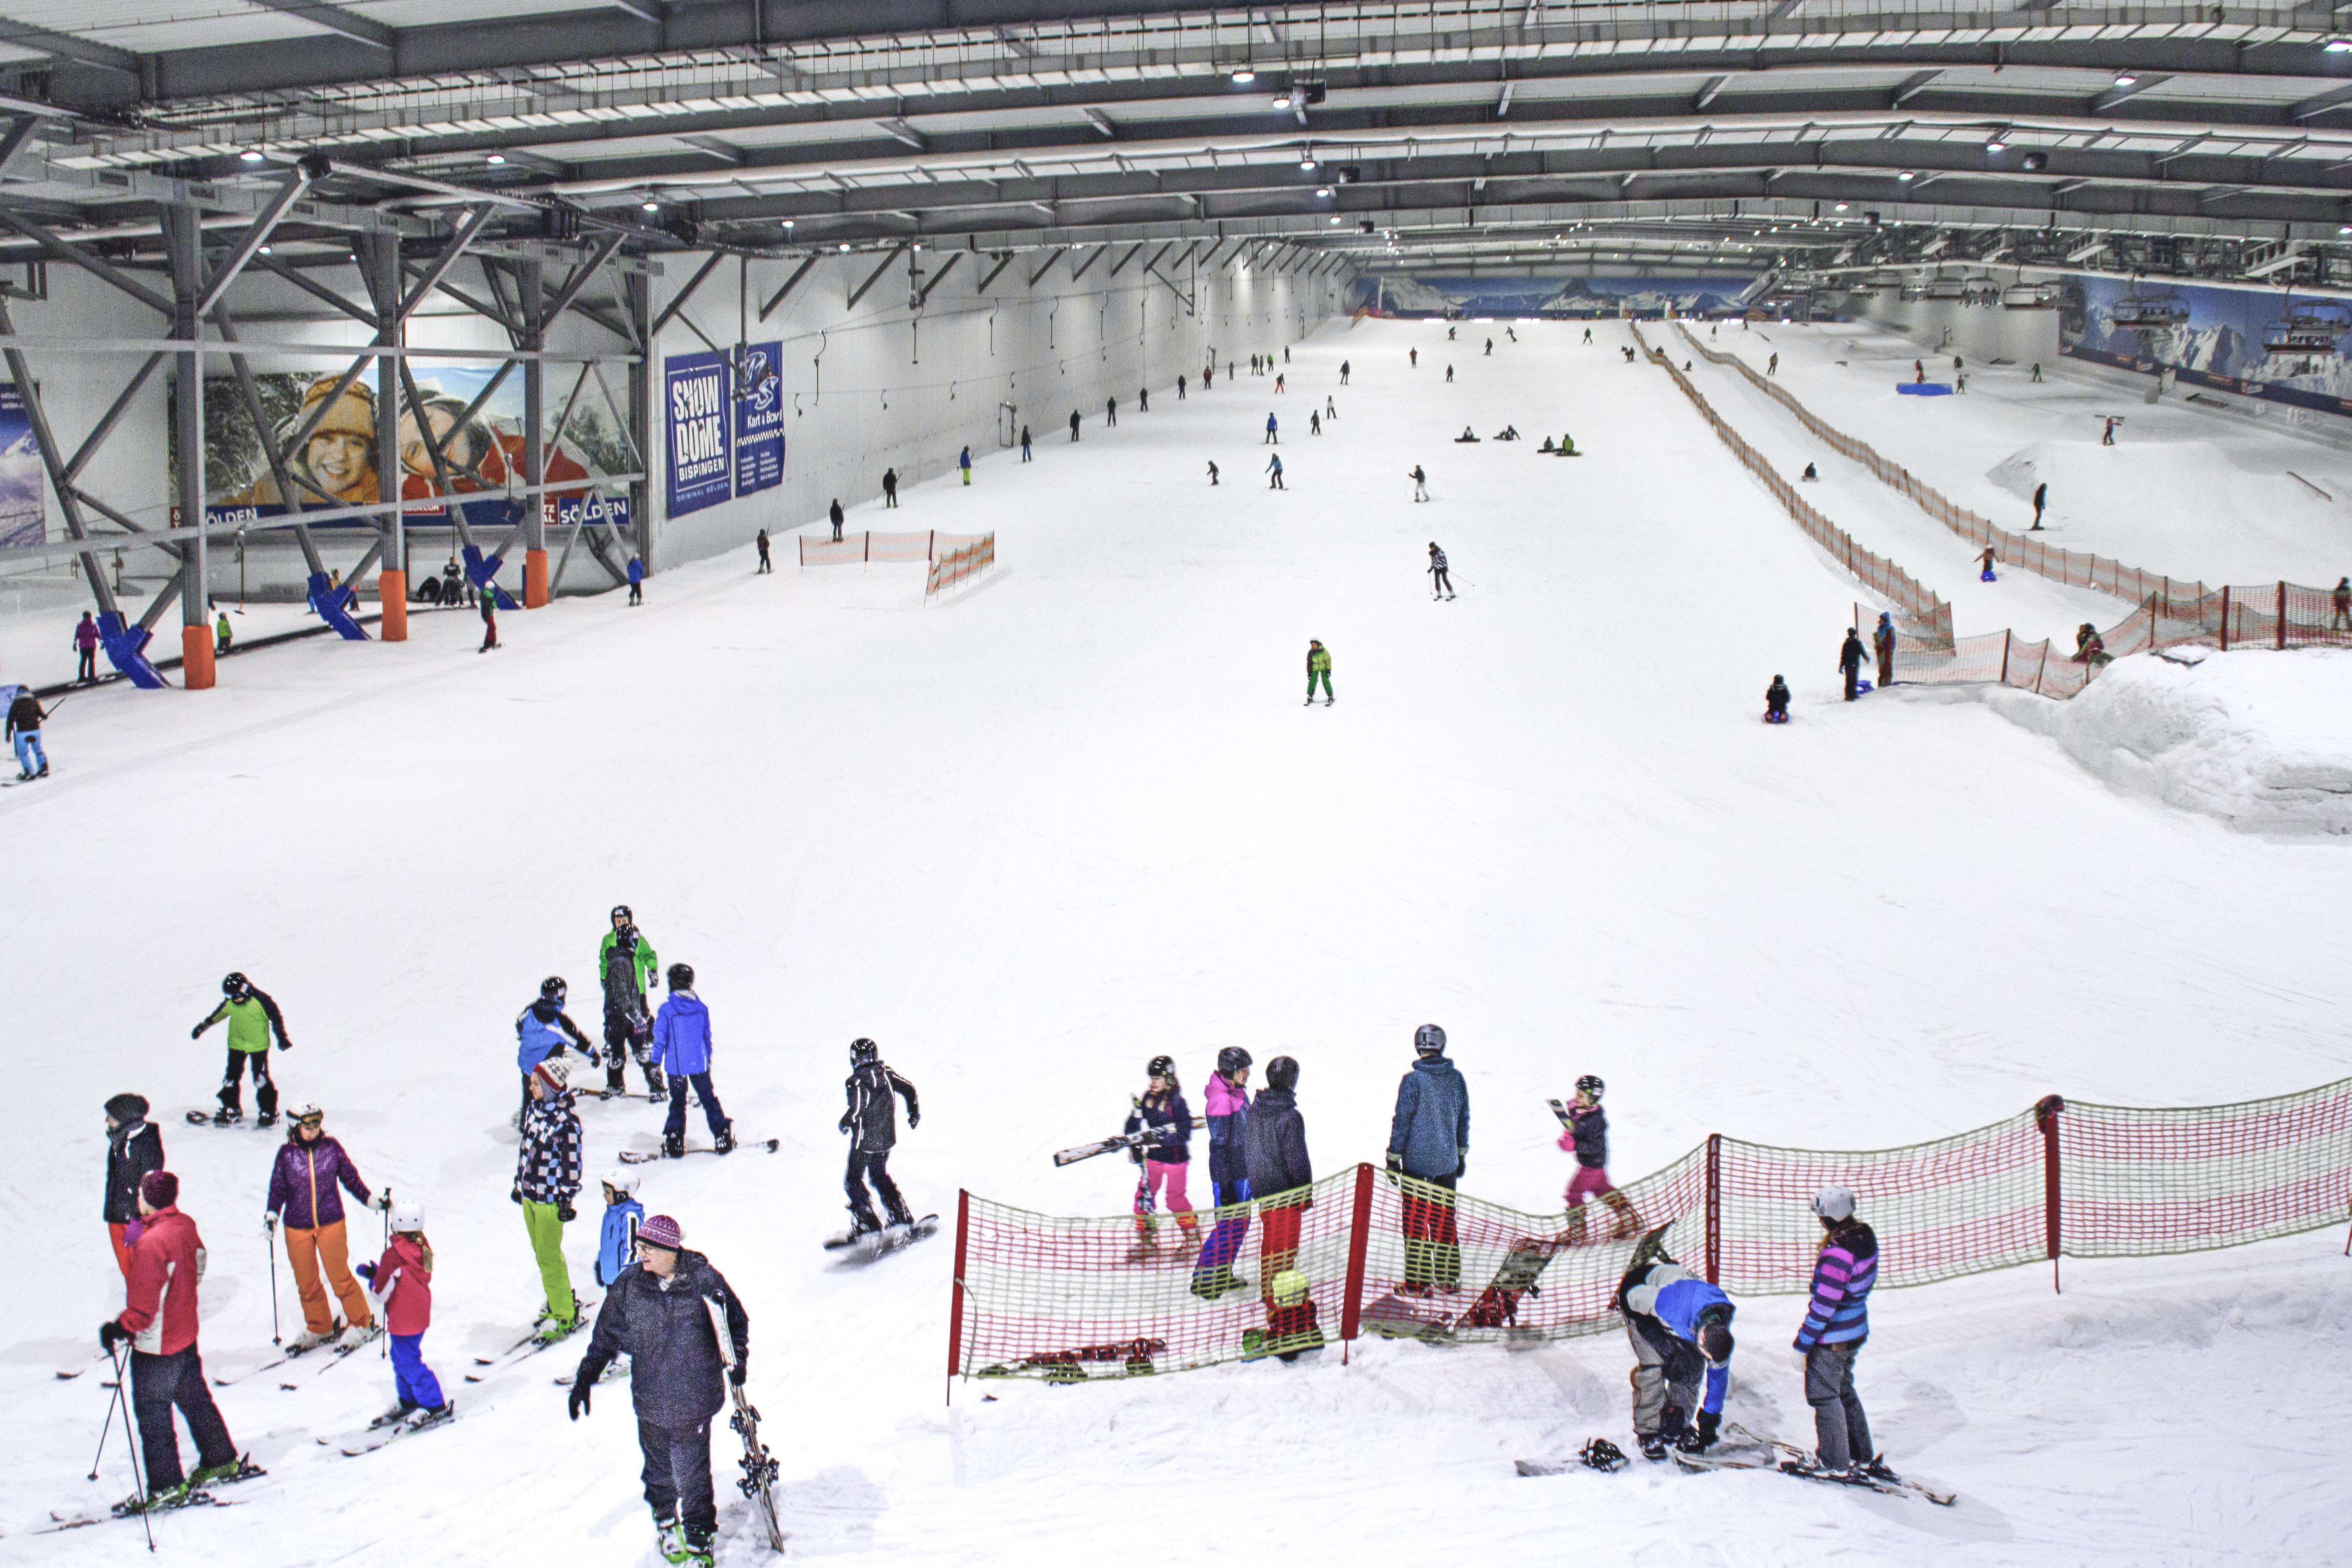 snow-dome-skihalle